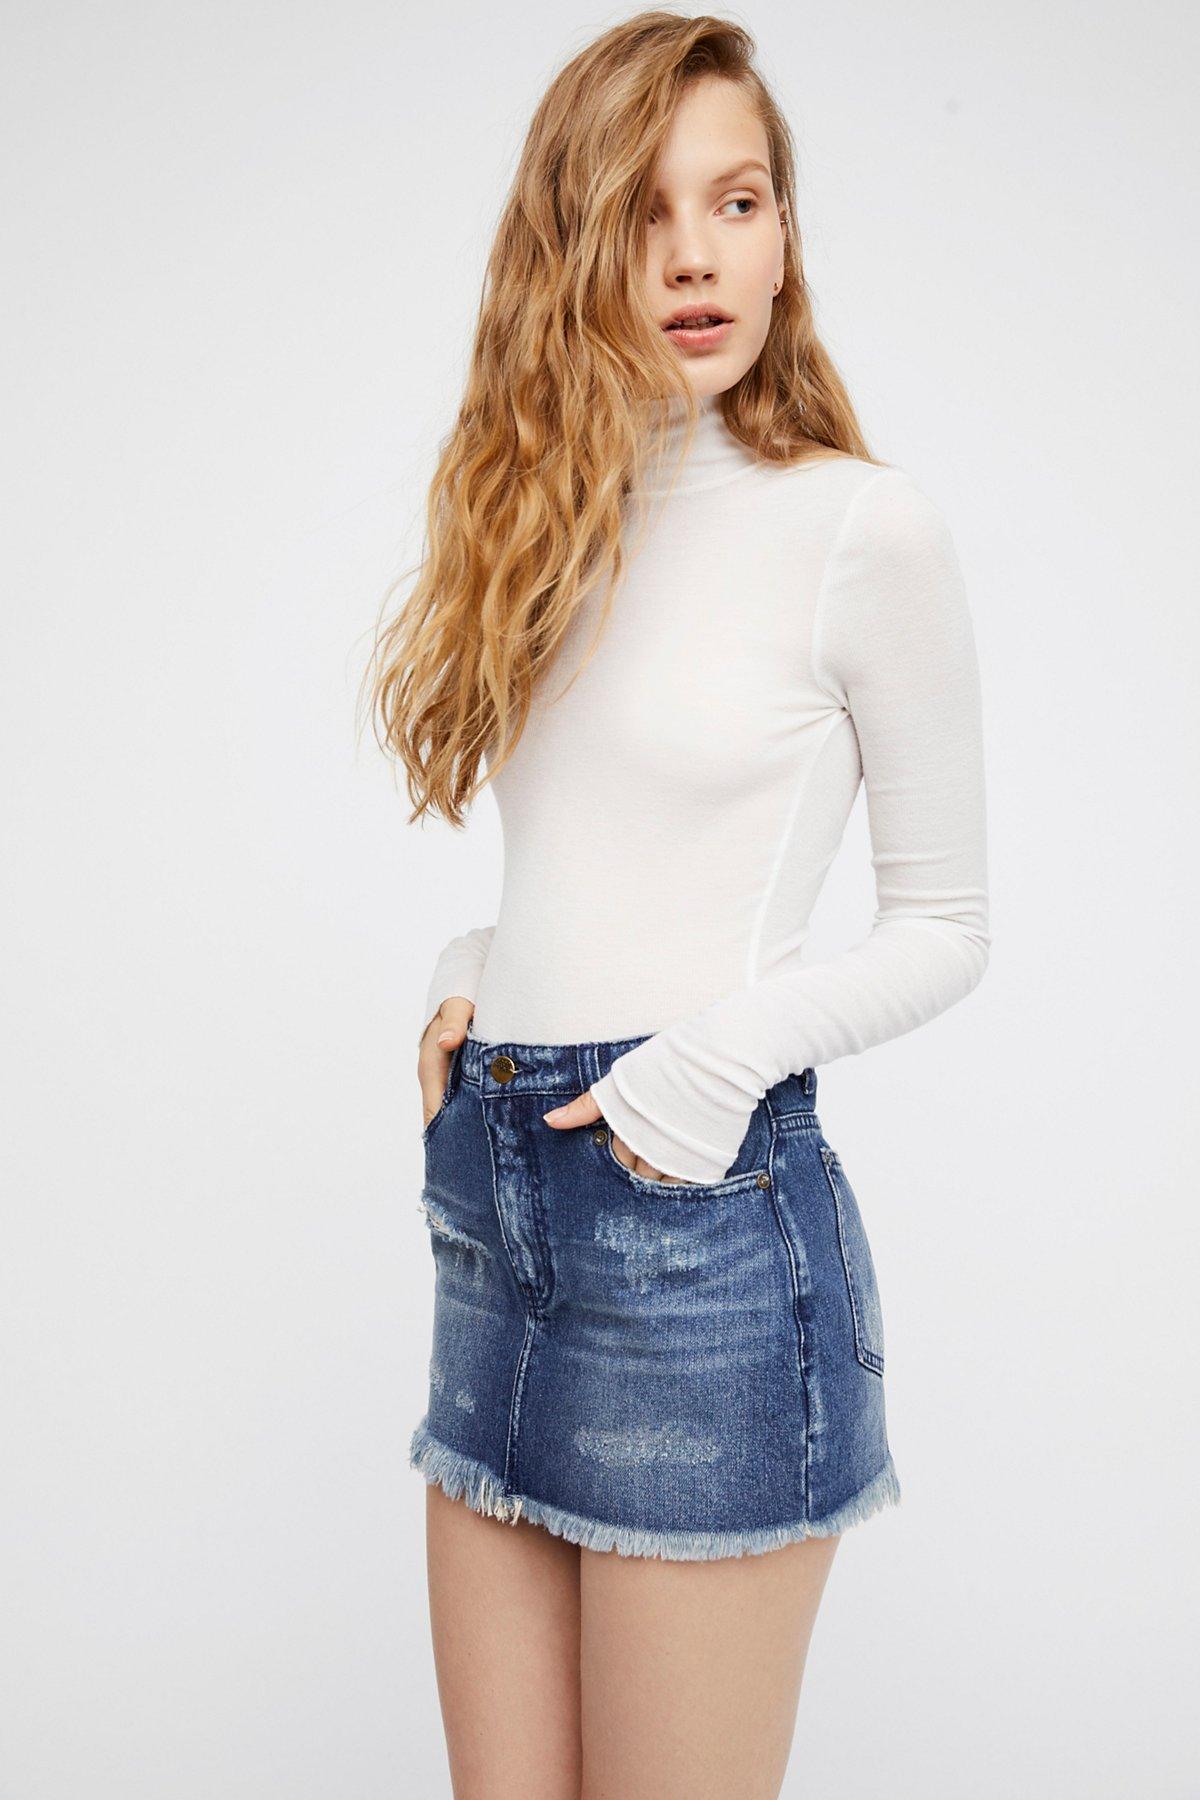 Resultado de imagen para mini skirt